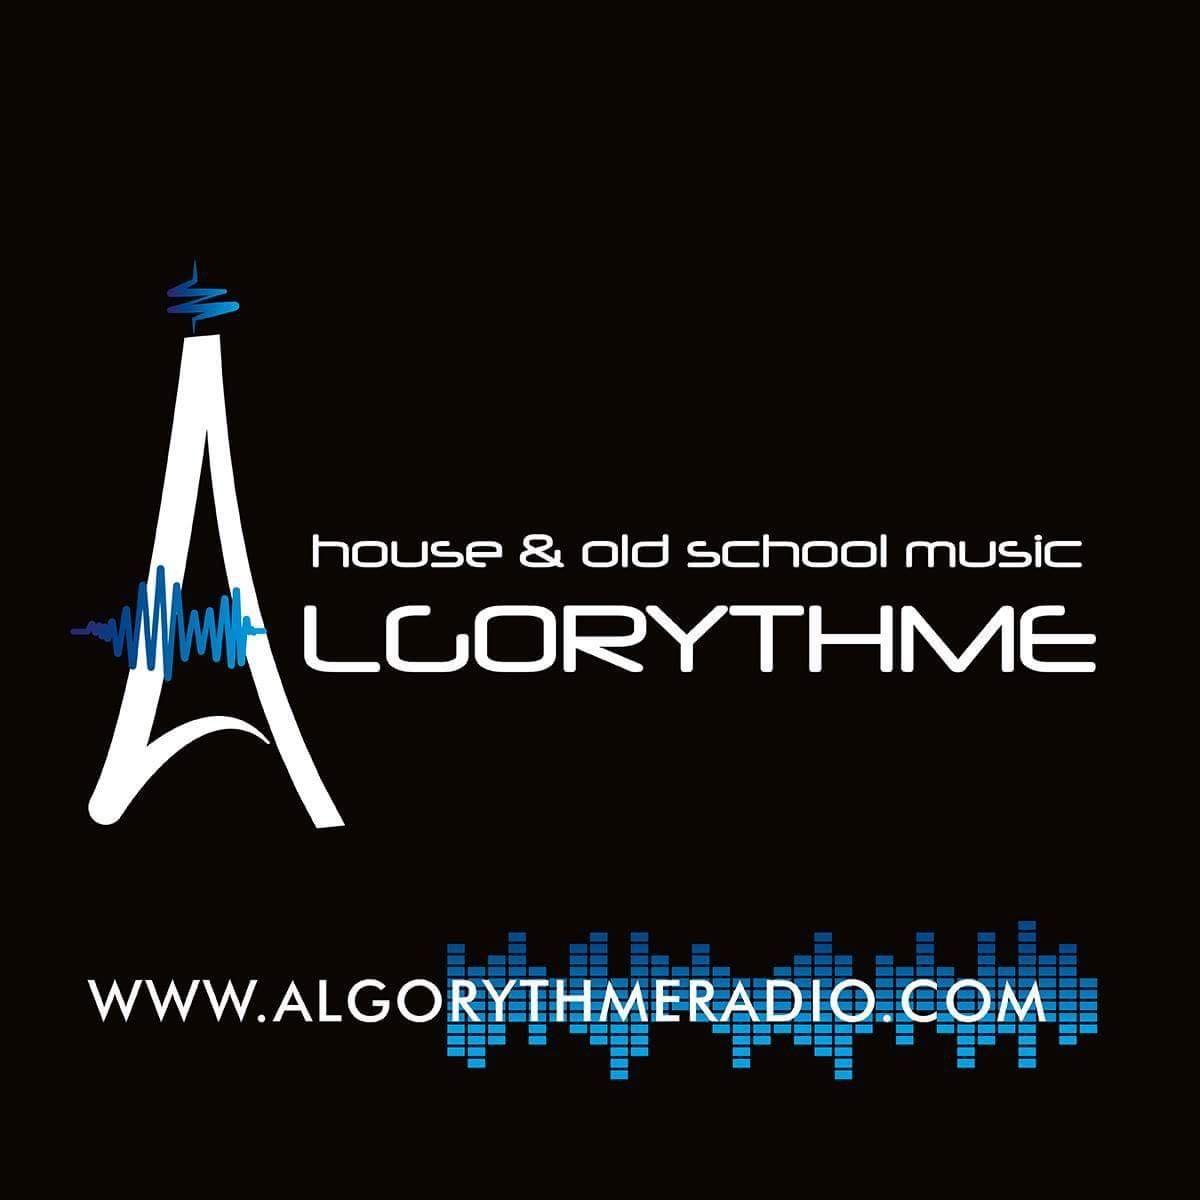 Algorythme Radio, un son House Old School très original